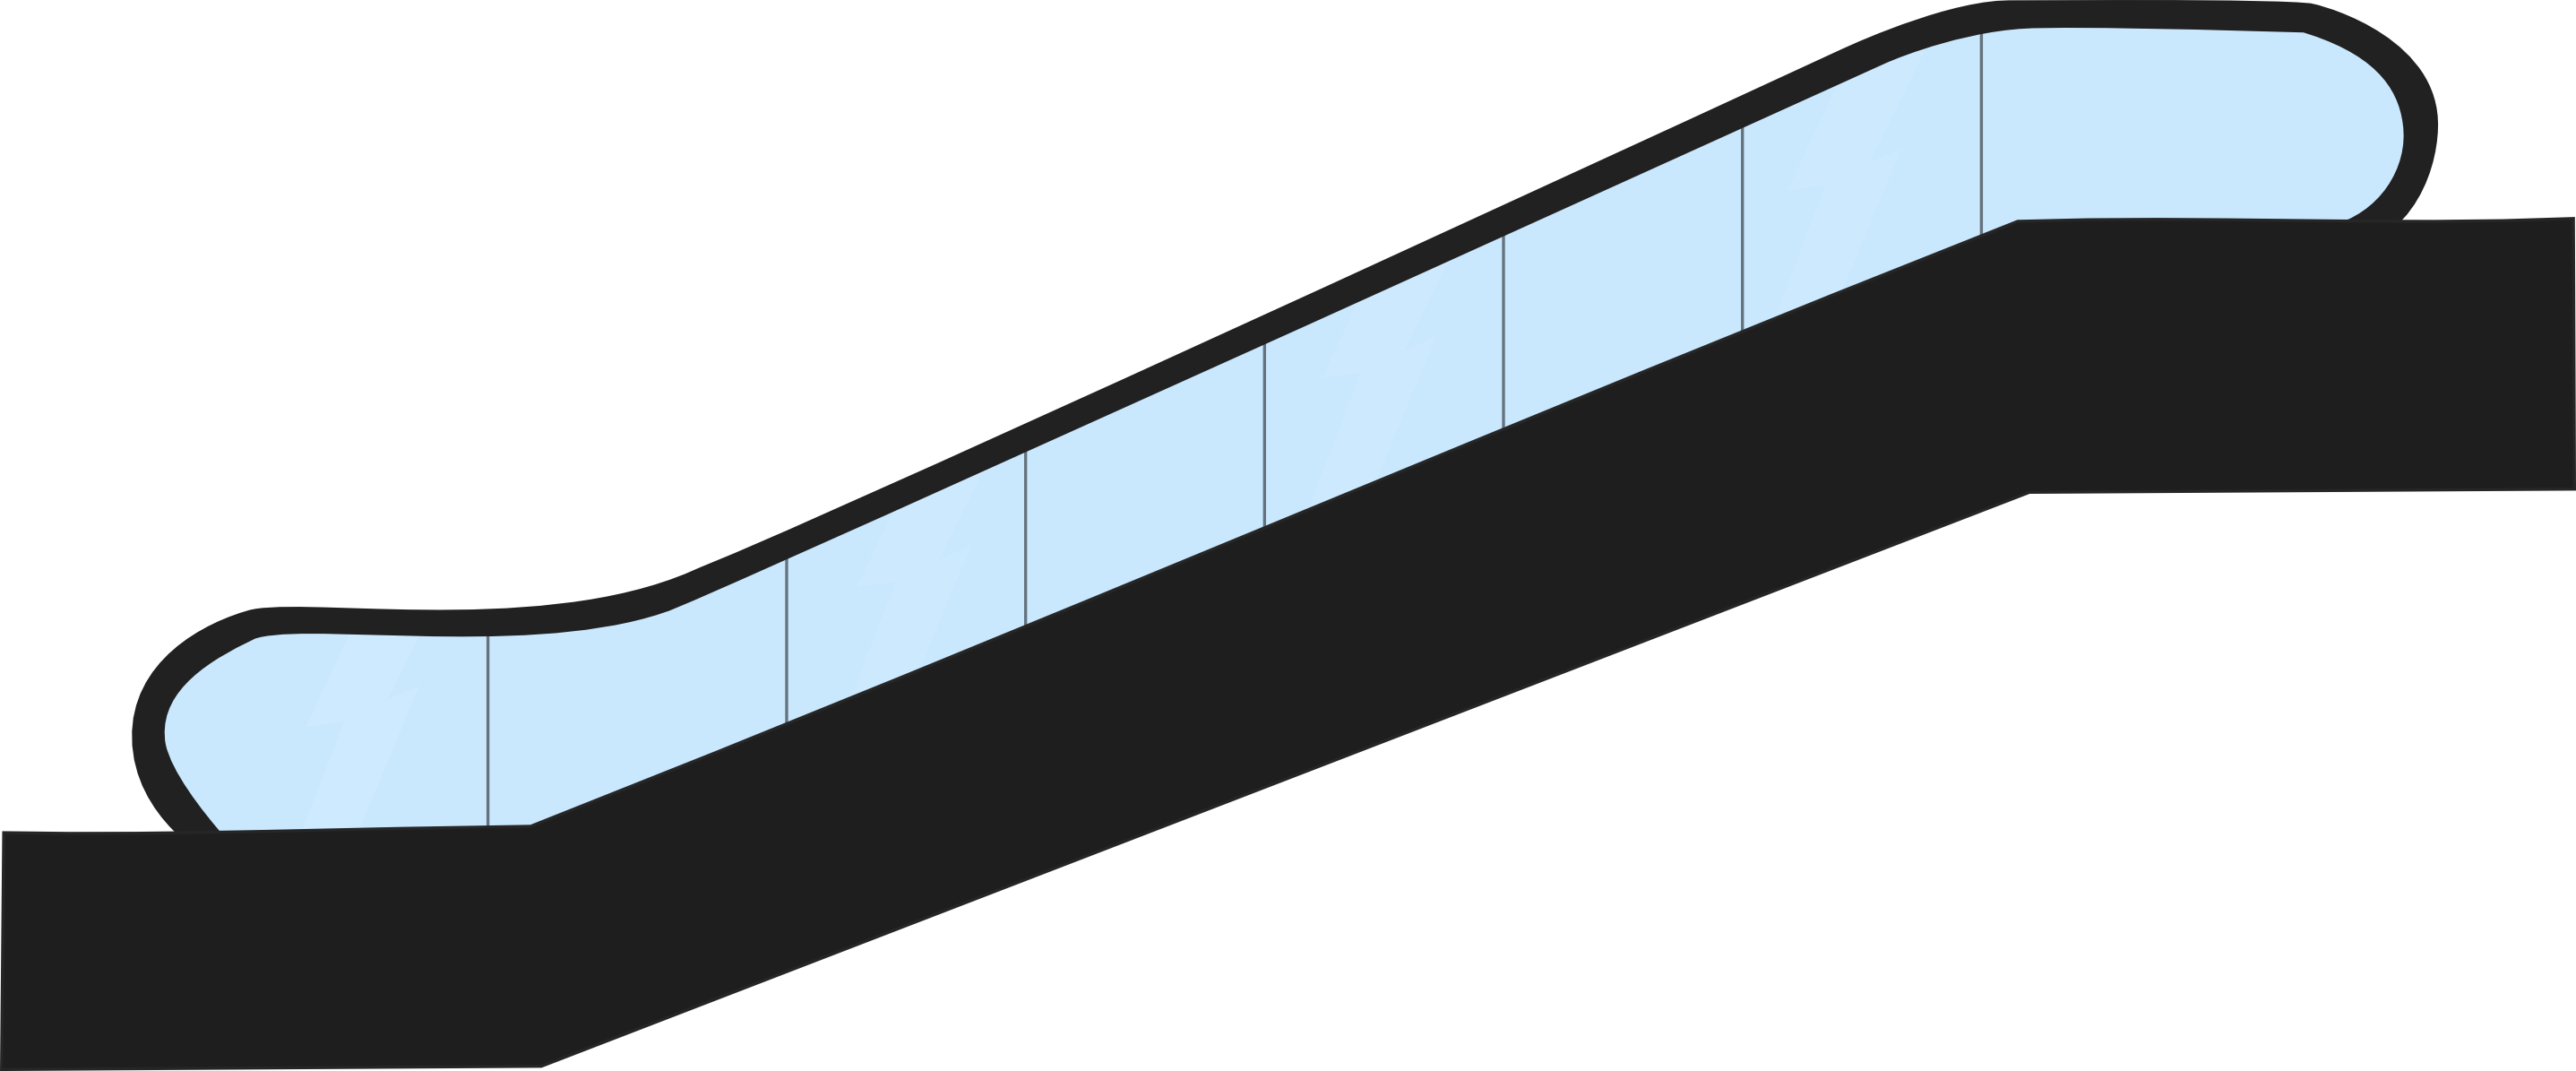 Escalator clipart Clipart Escalator Panda Images Clipart